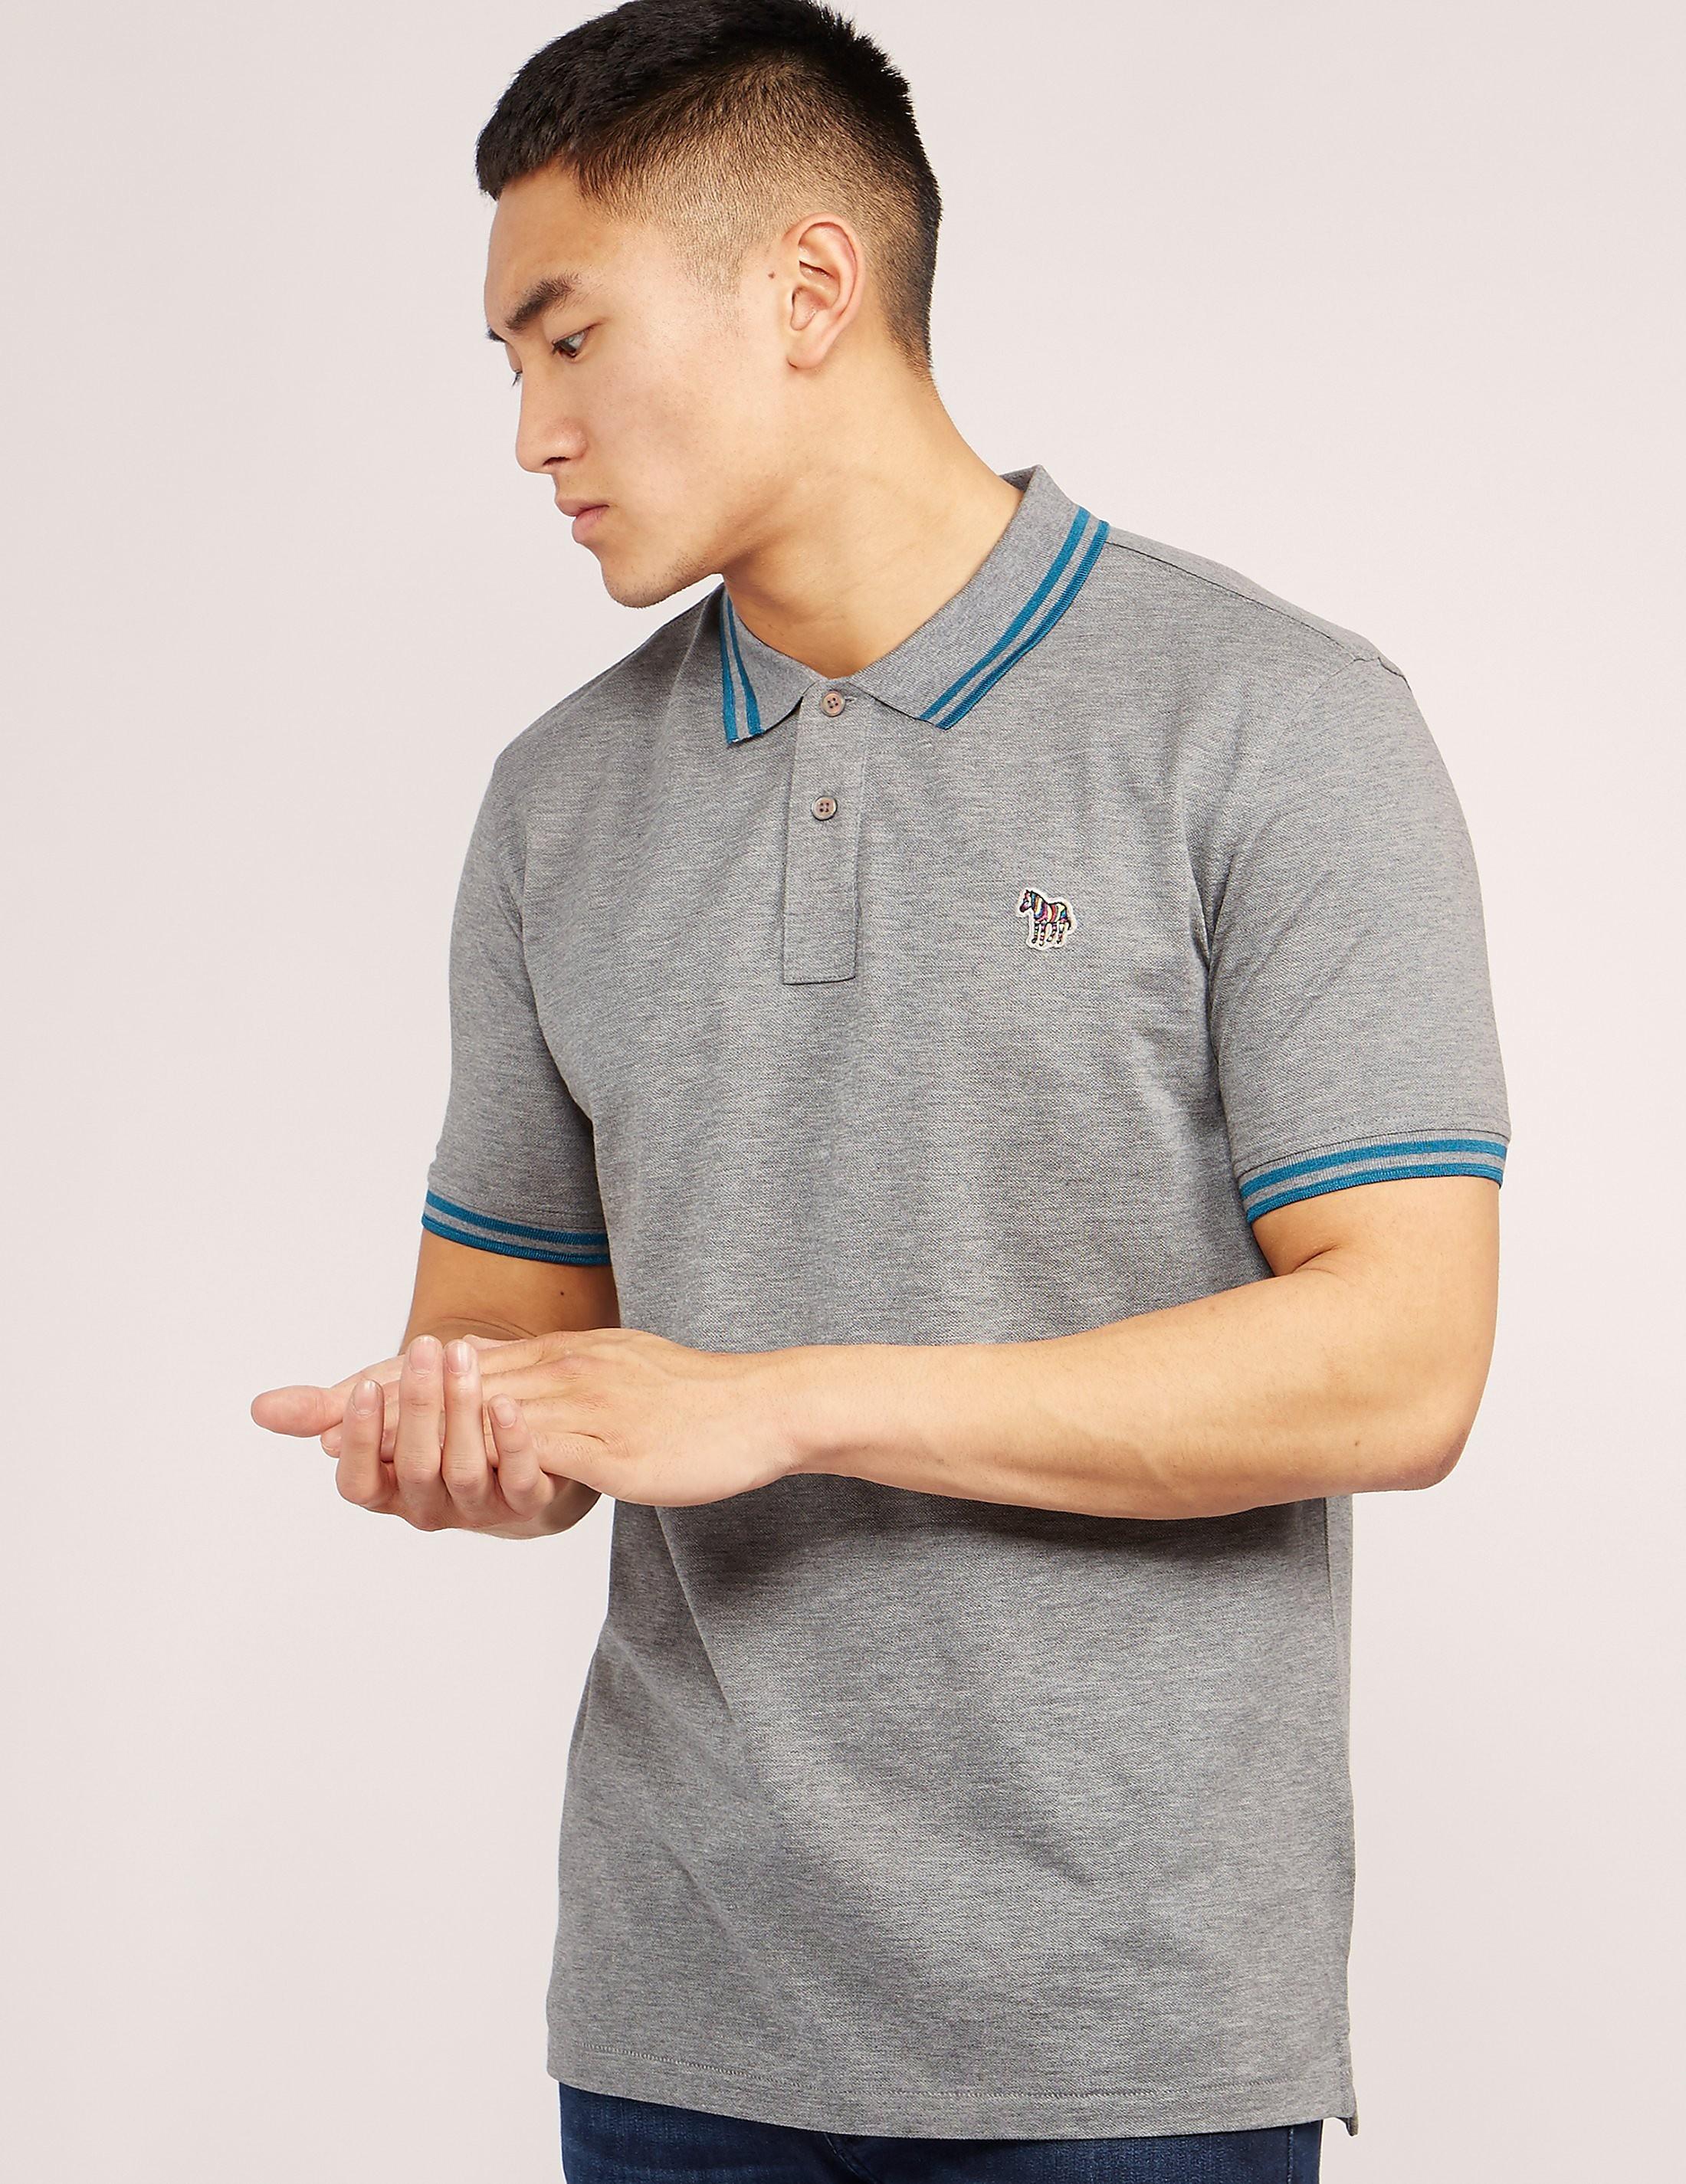 Paul Smith Tipped Short Sleeve Polo Shirt